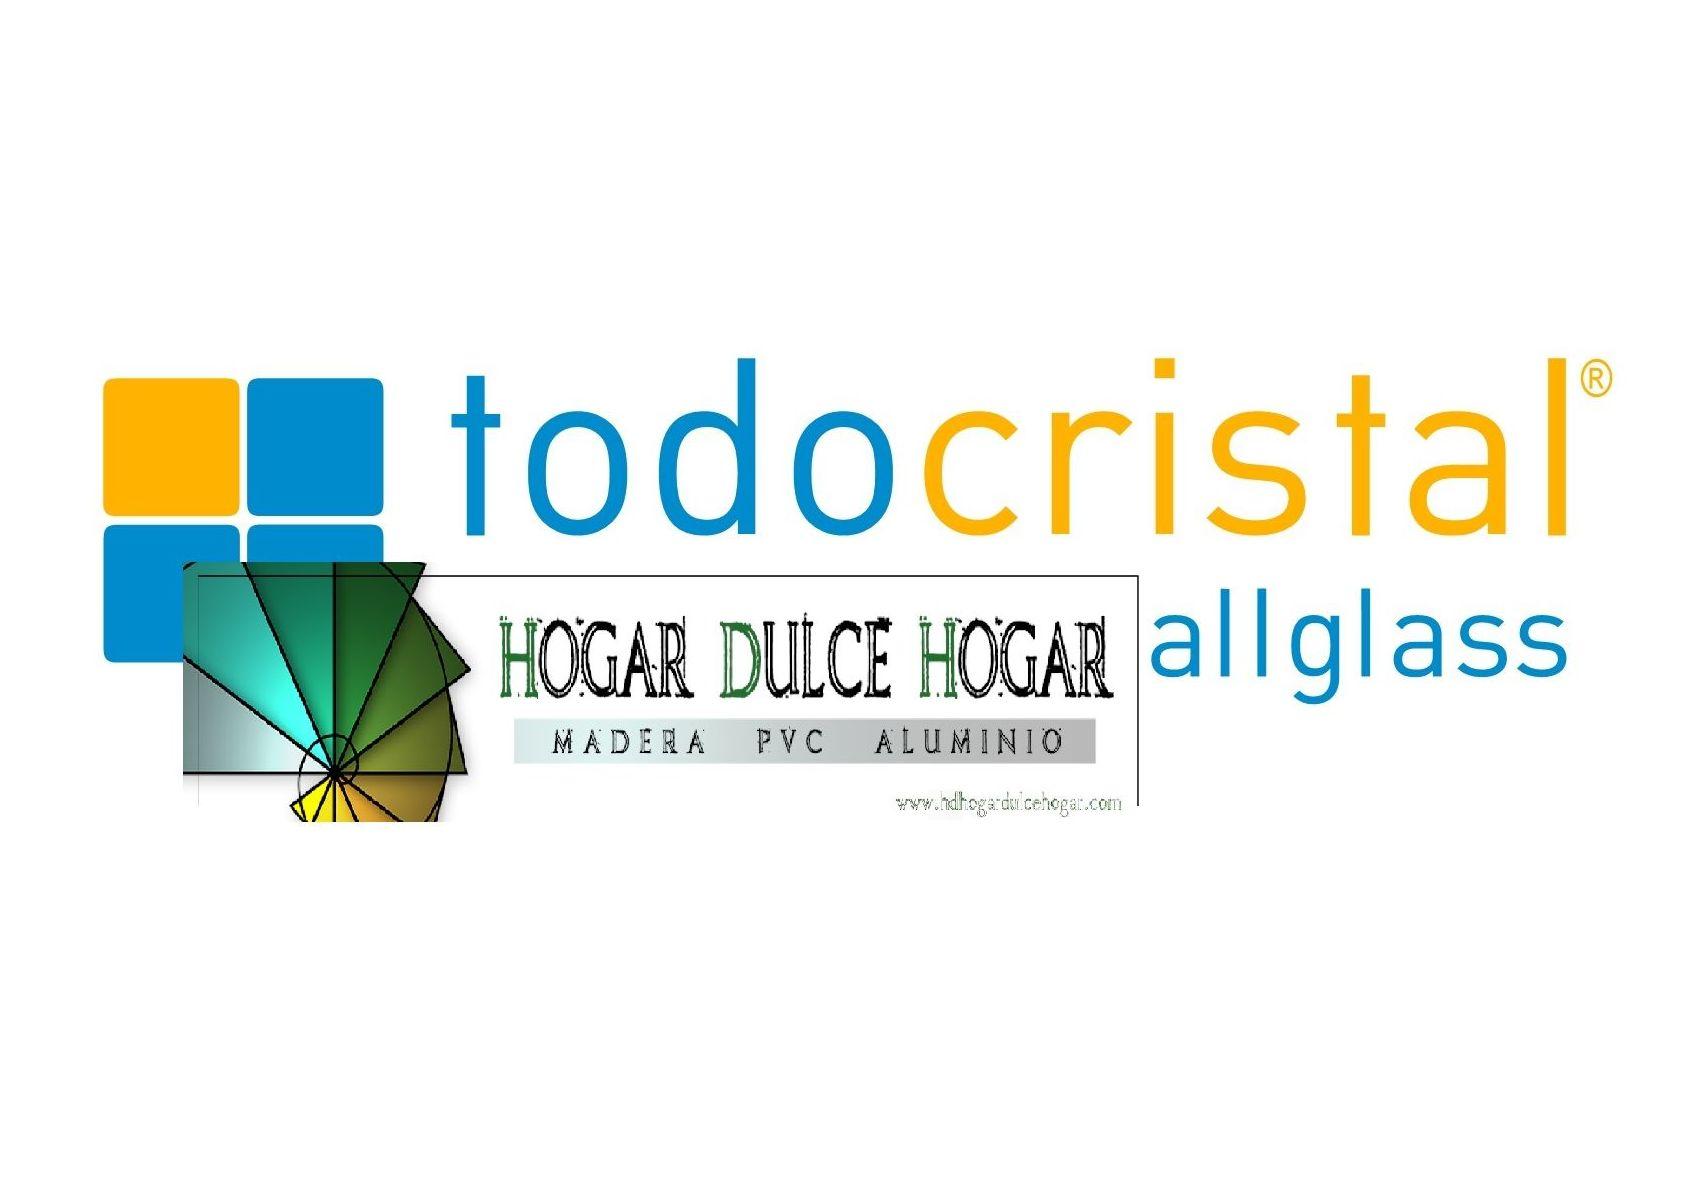 Distribuidores e instaladores oficiales de TODOCRISTAL ALL GLASS SYSTEMS